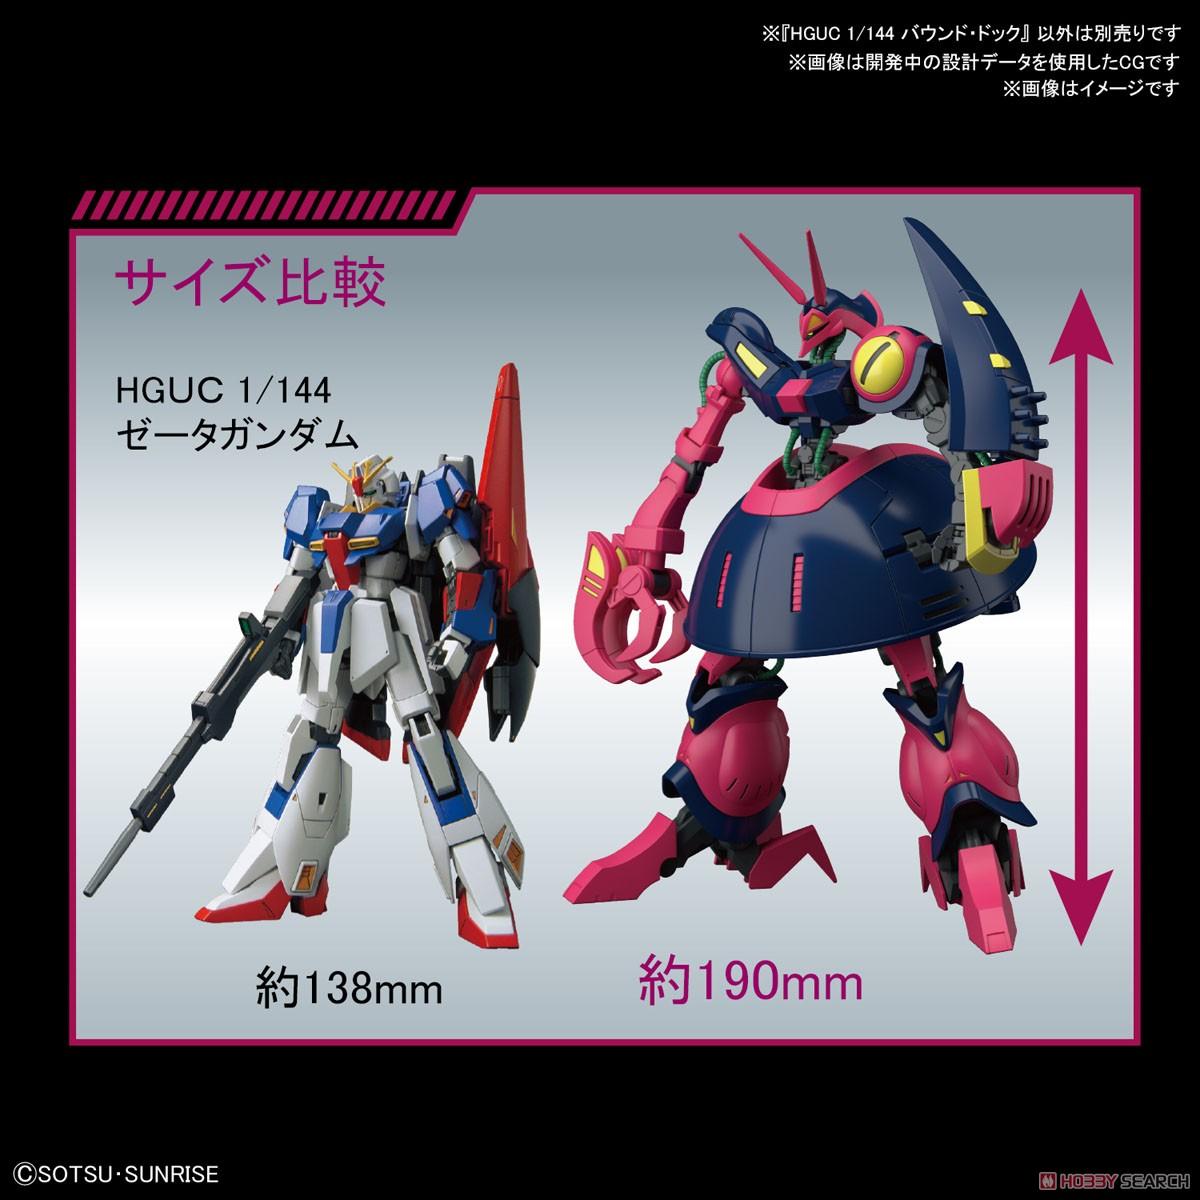 HGUC 1/144『バウンド・ドック』機動戦士Zガンダム プラモデル-016